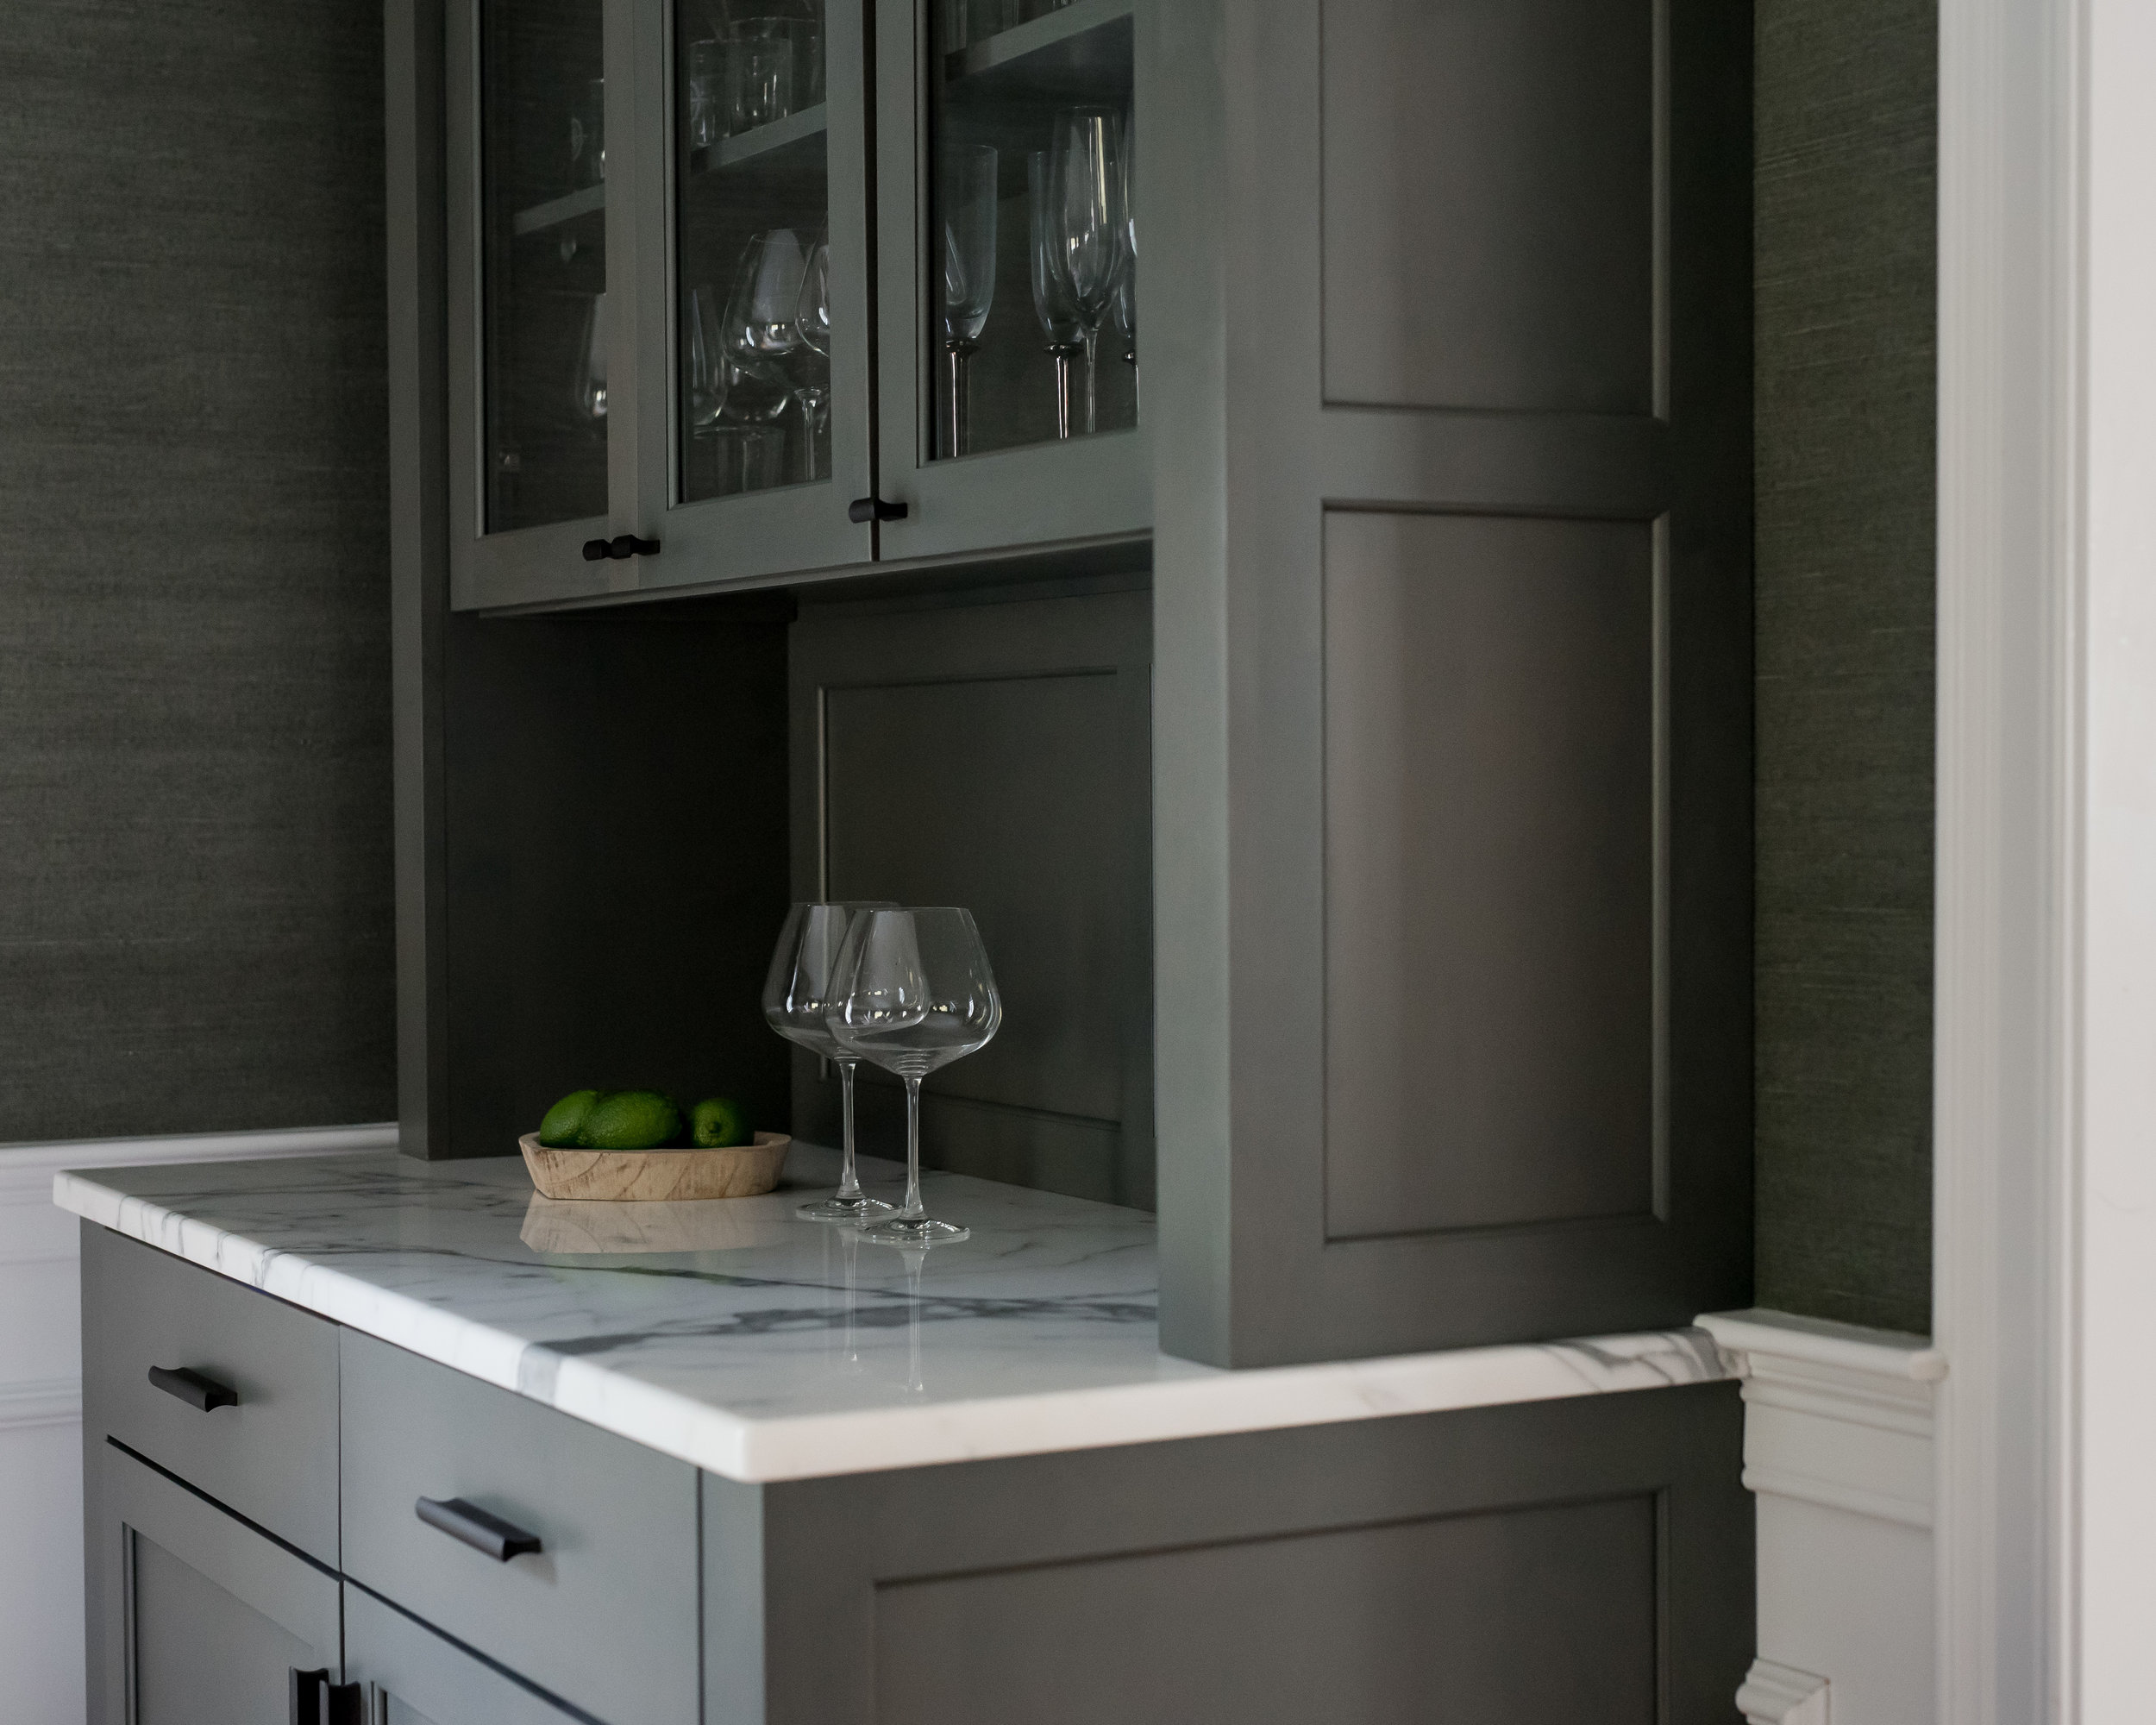 gina baran interiors + design boston interior designer dining room